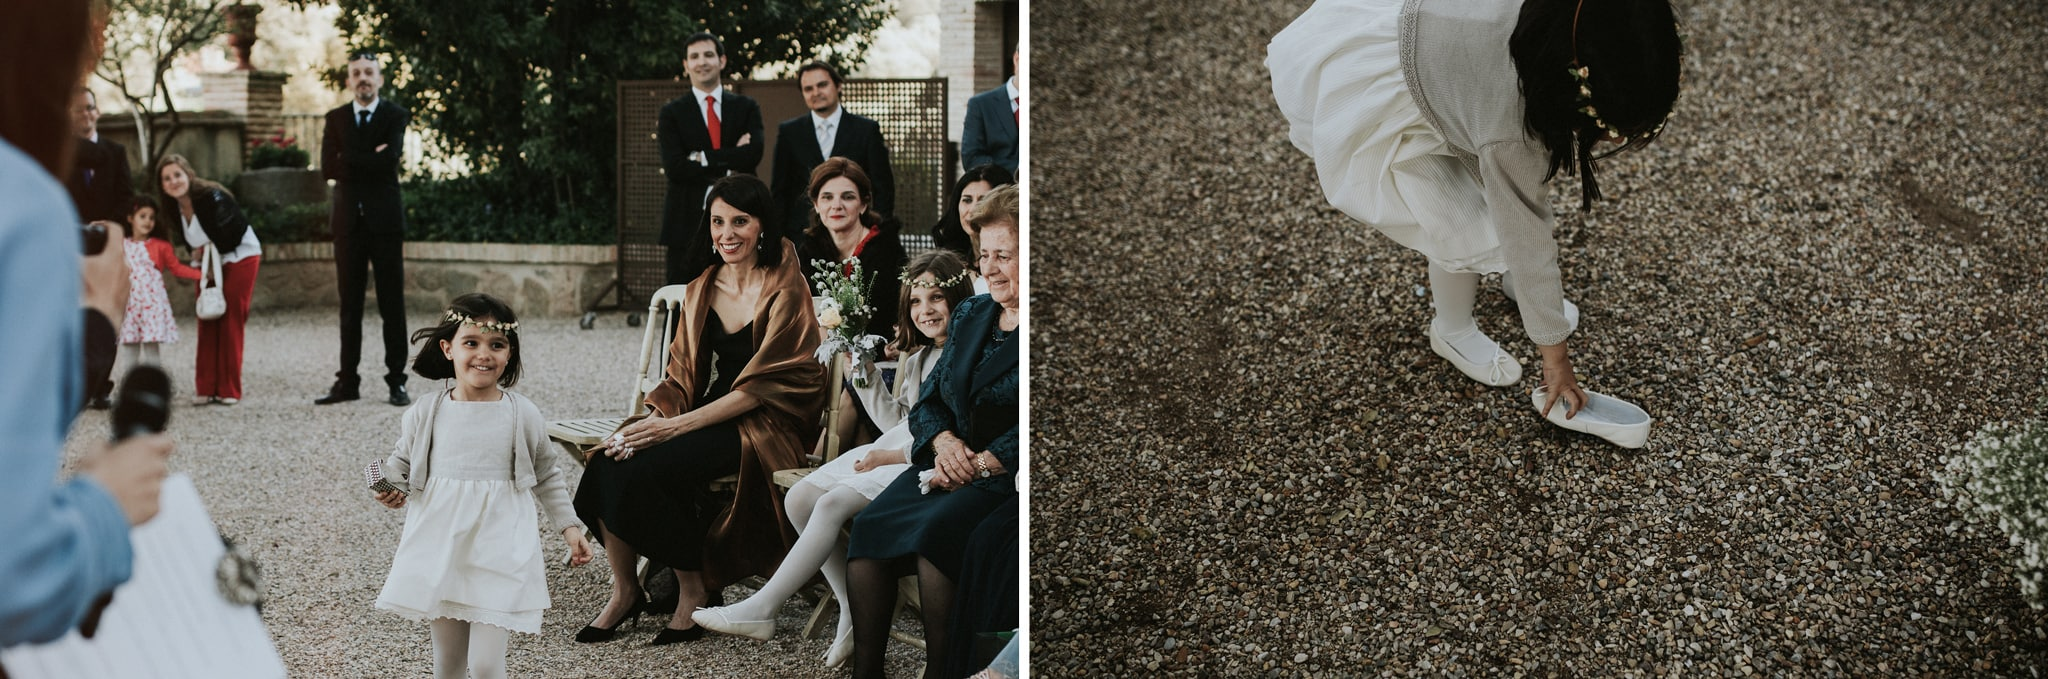 Fotografo-bodas-Cigarral-de-las-Mercedes-80